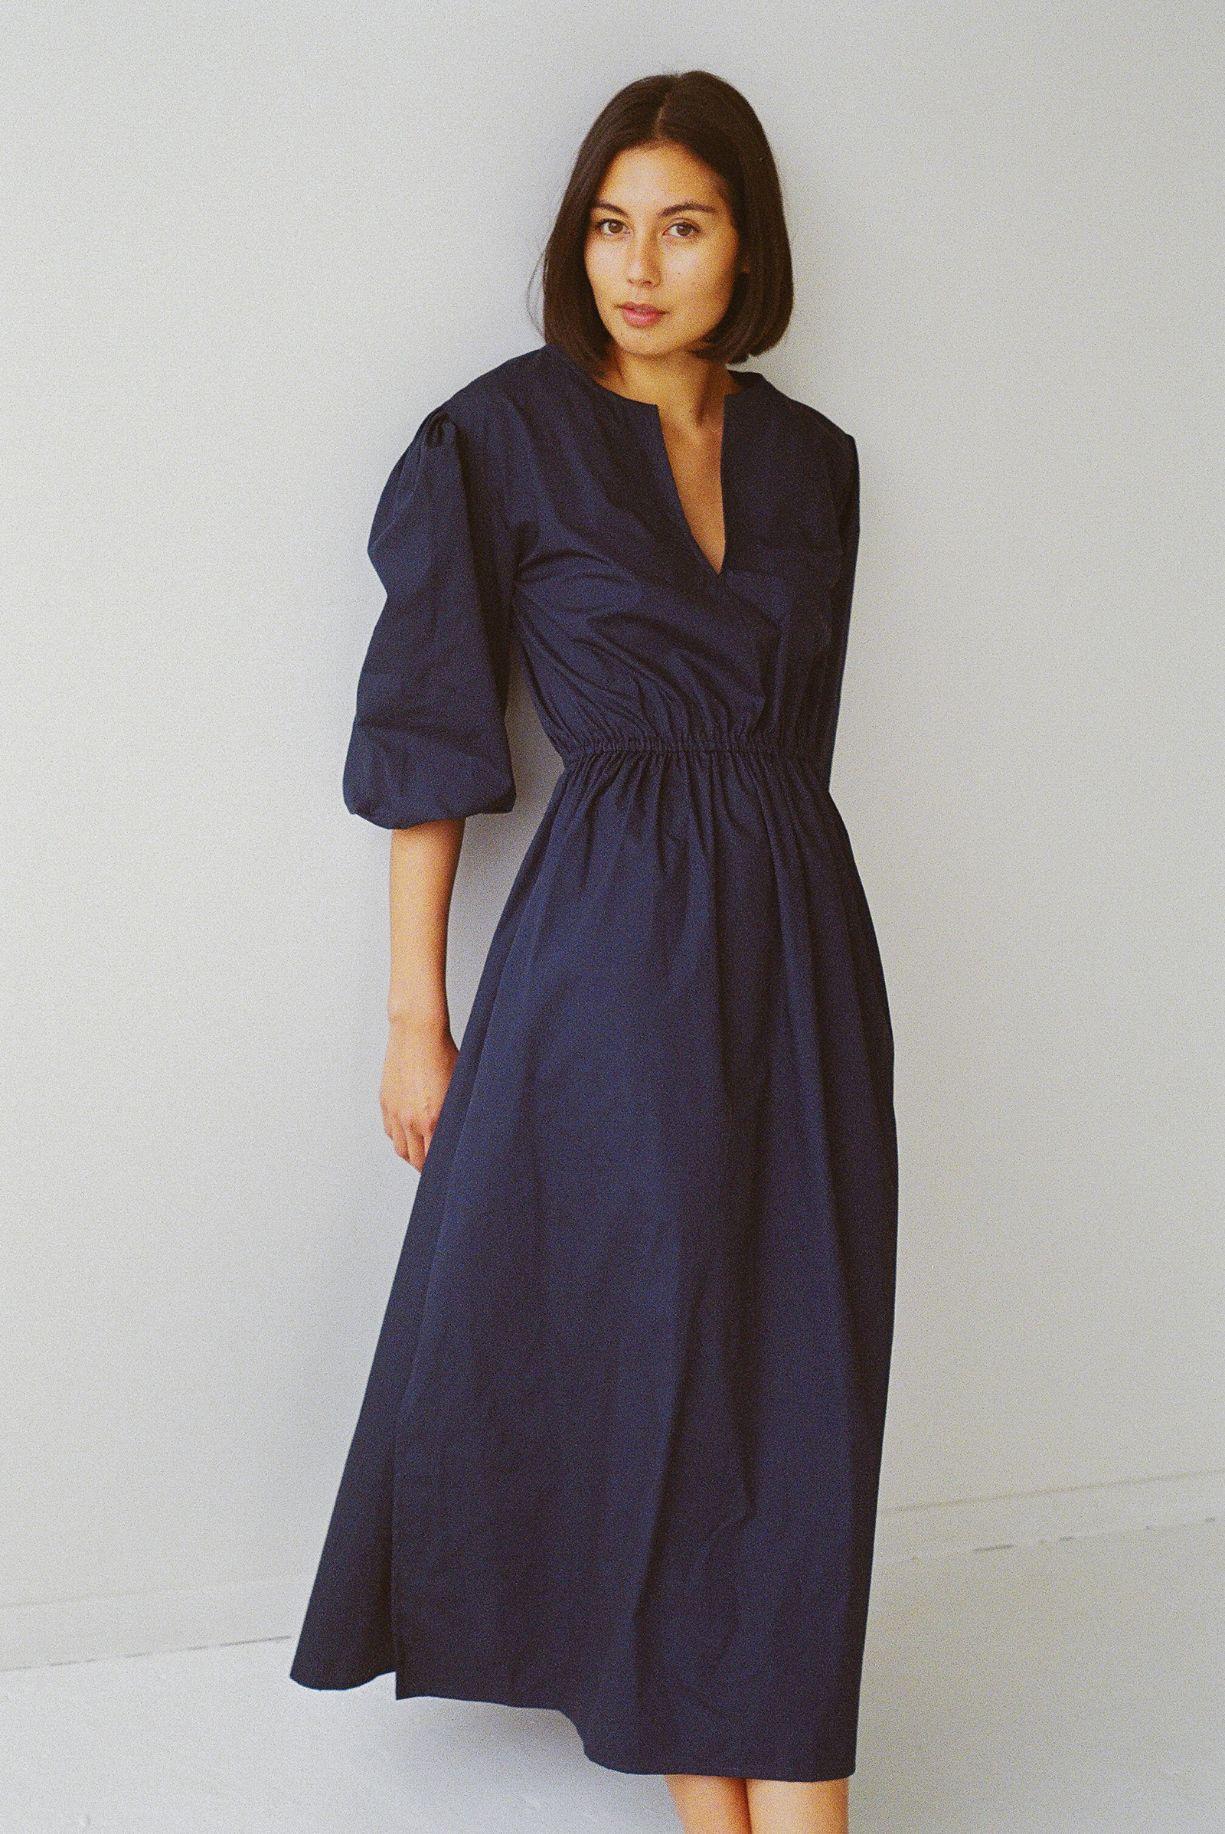 Klein maxi dress navy cotton - Ellis Label - New Zealand womens designer clothing_0004_83070004